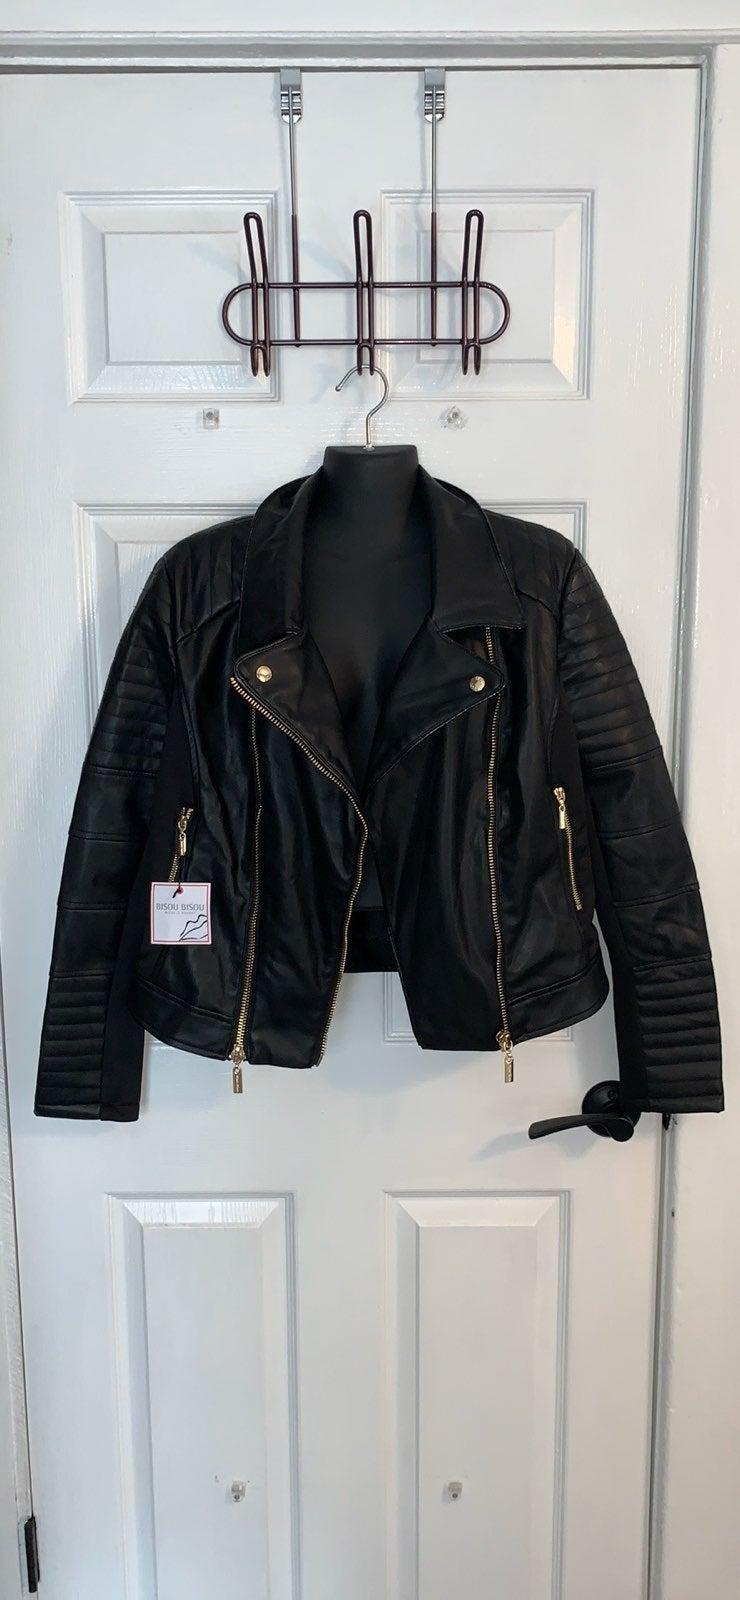 BisouBisou Michele Bohbot Leather Jacket